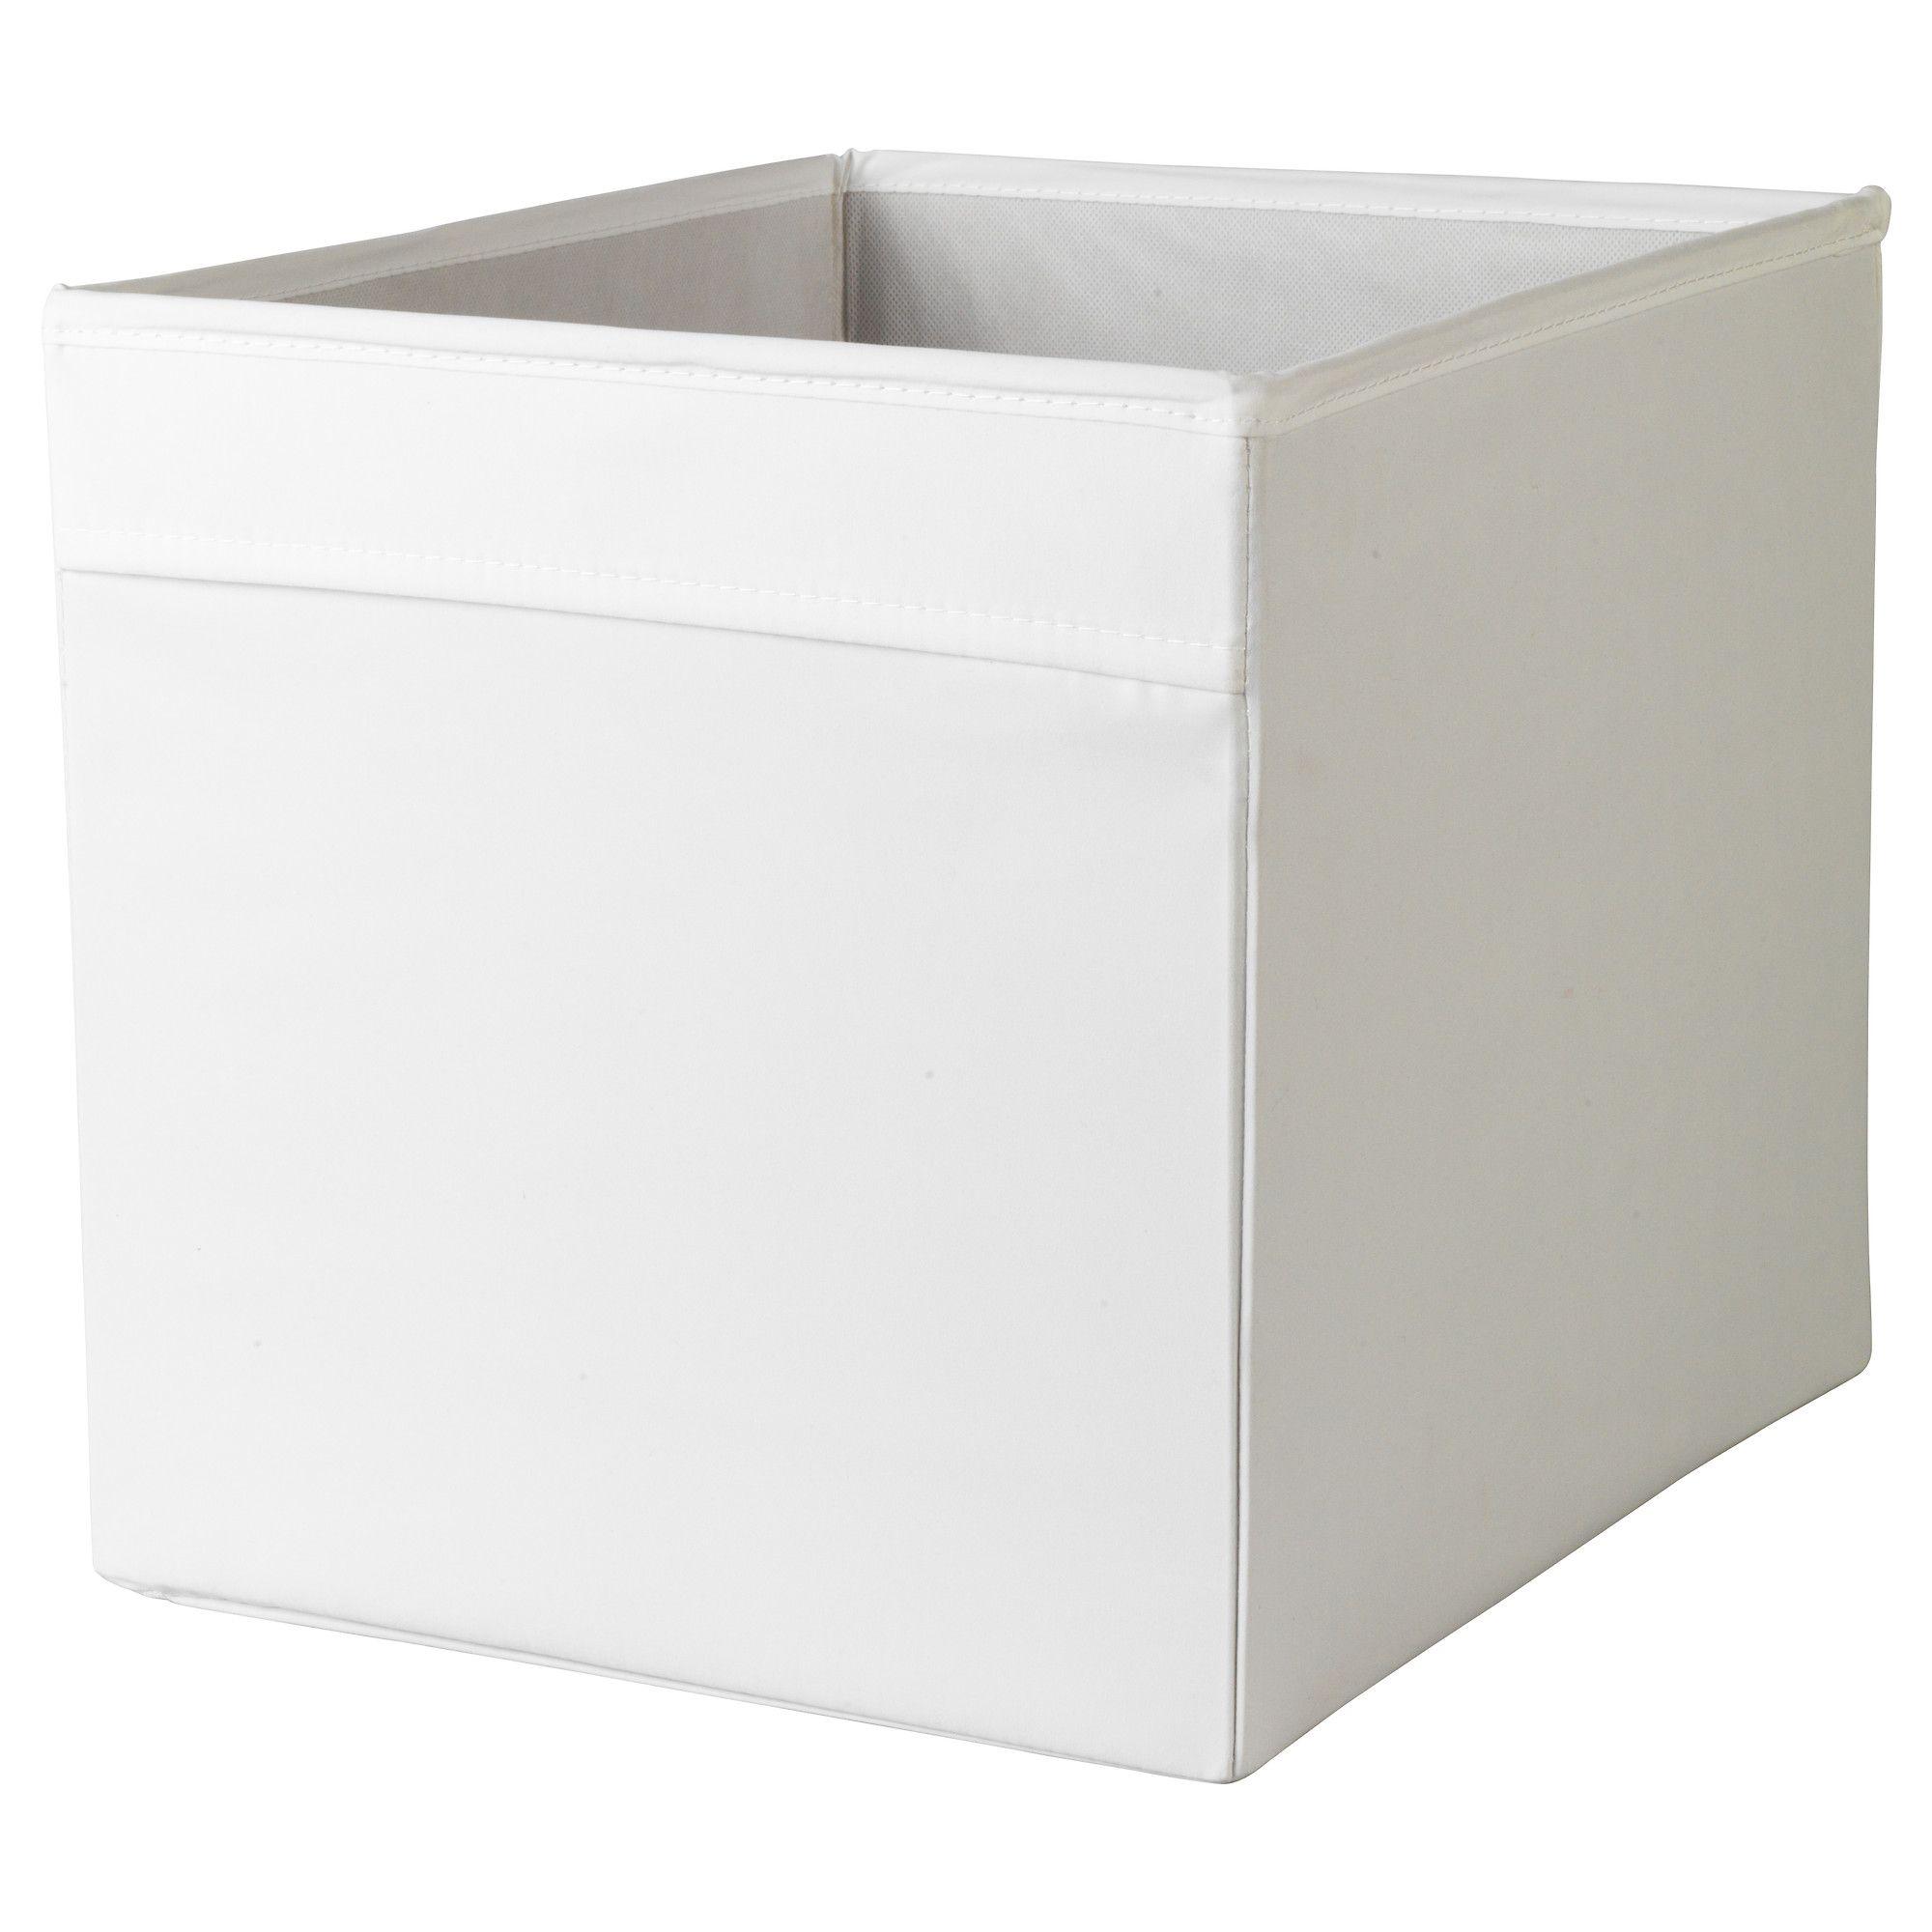 Dr Na Bo Te Tiroir Blanc Tiroir Et Ikea # Meuble Expedit Blanc